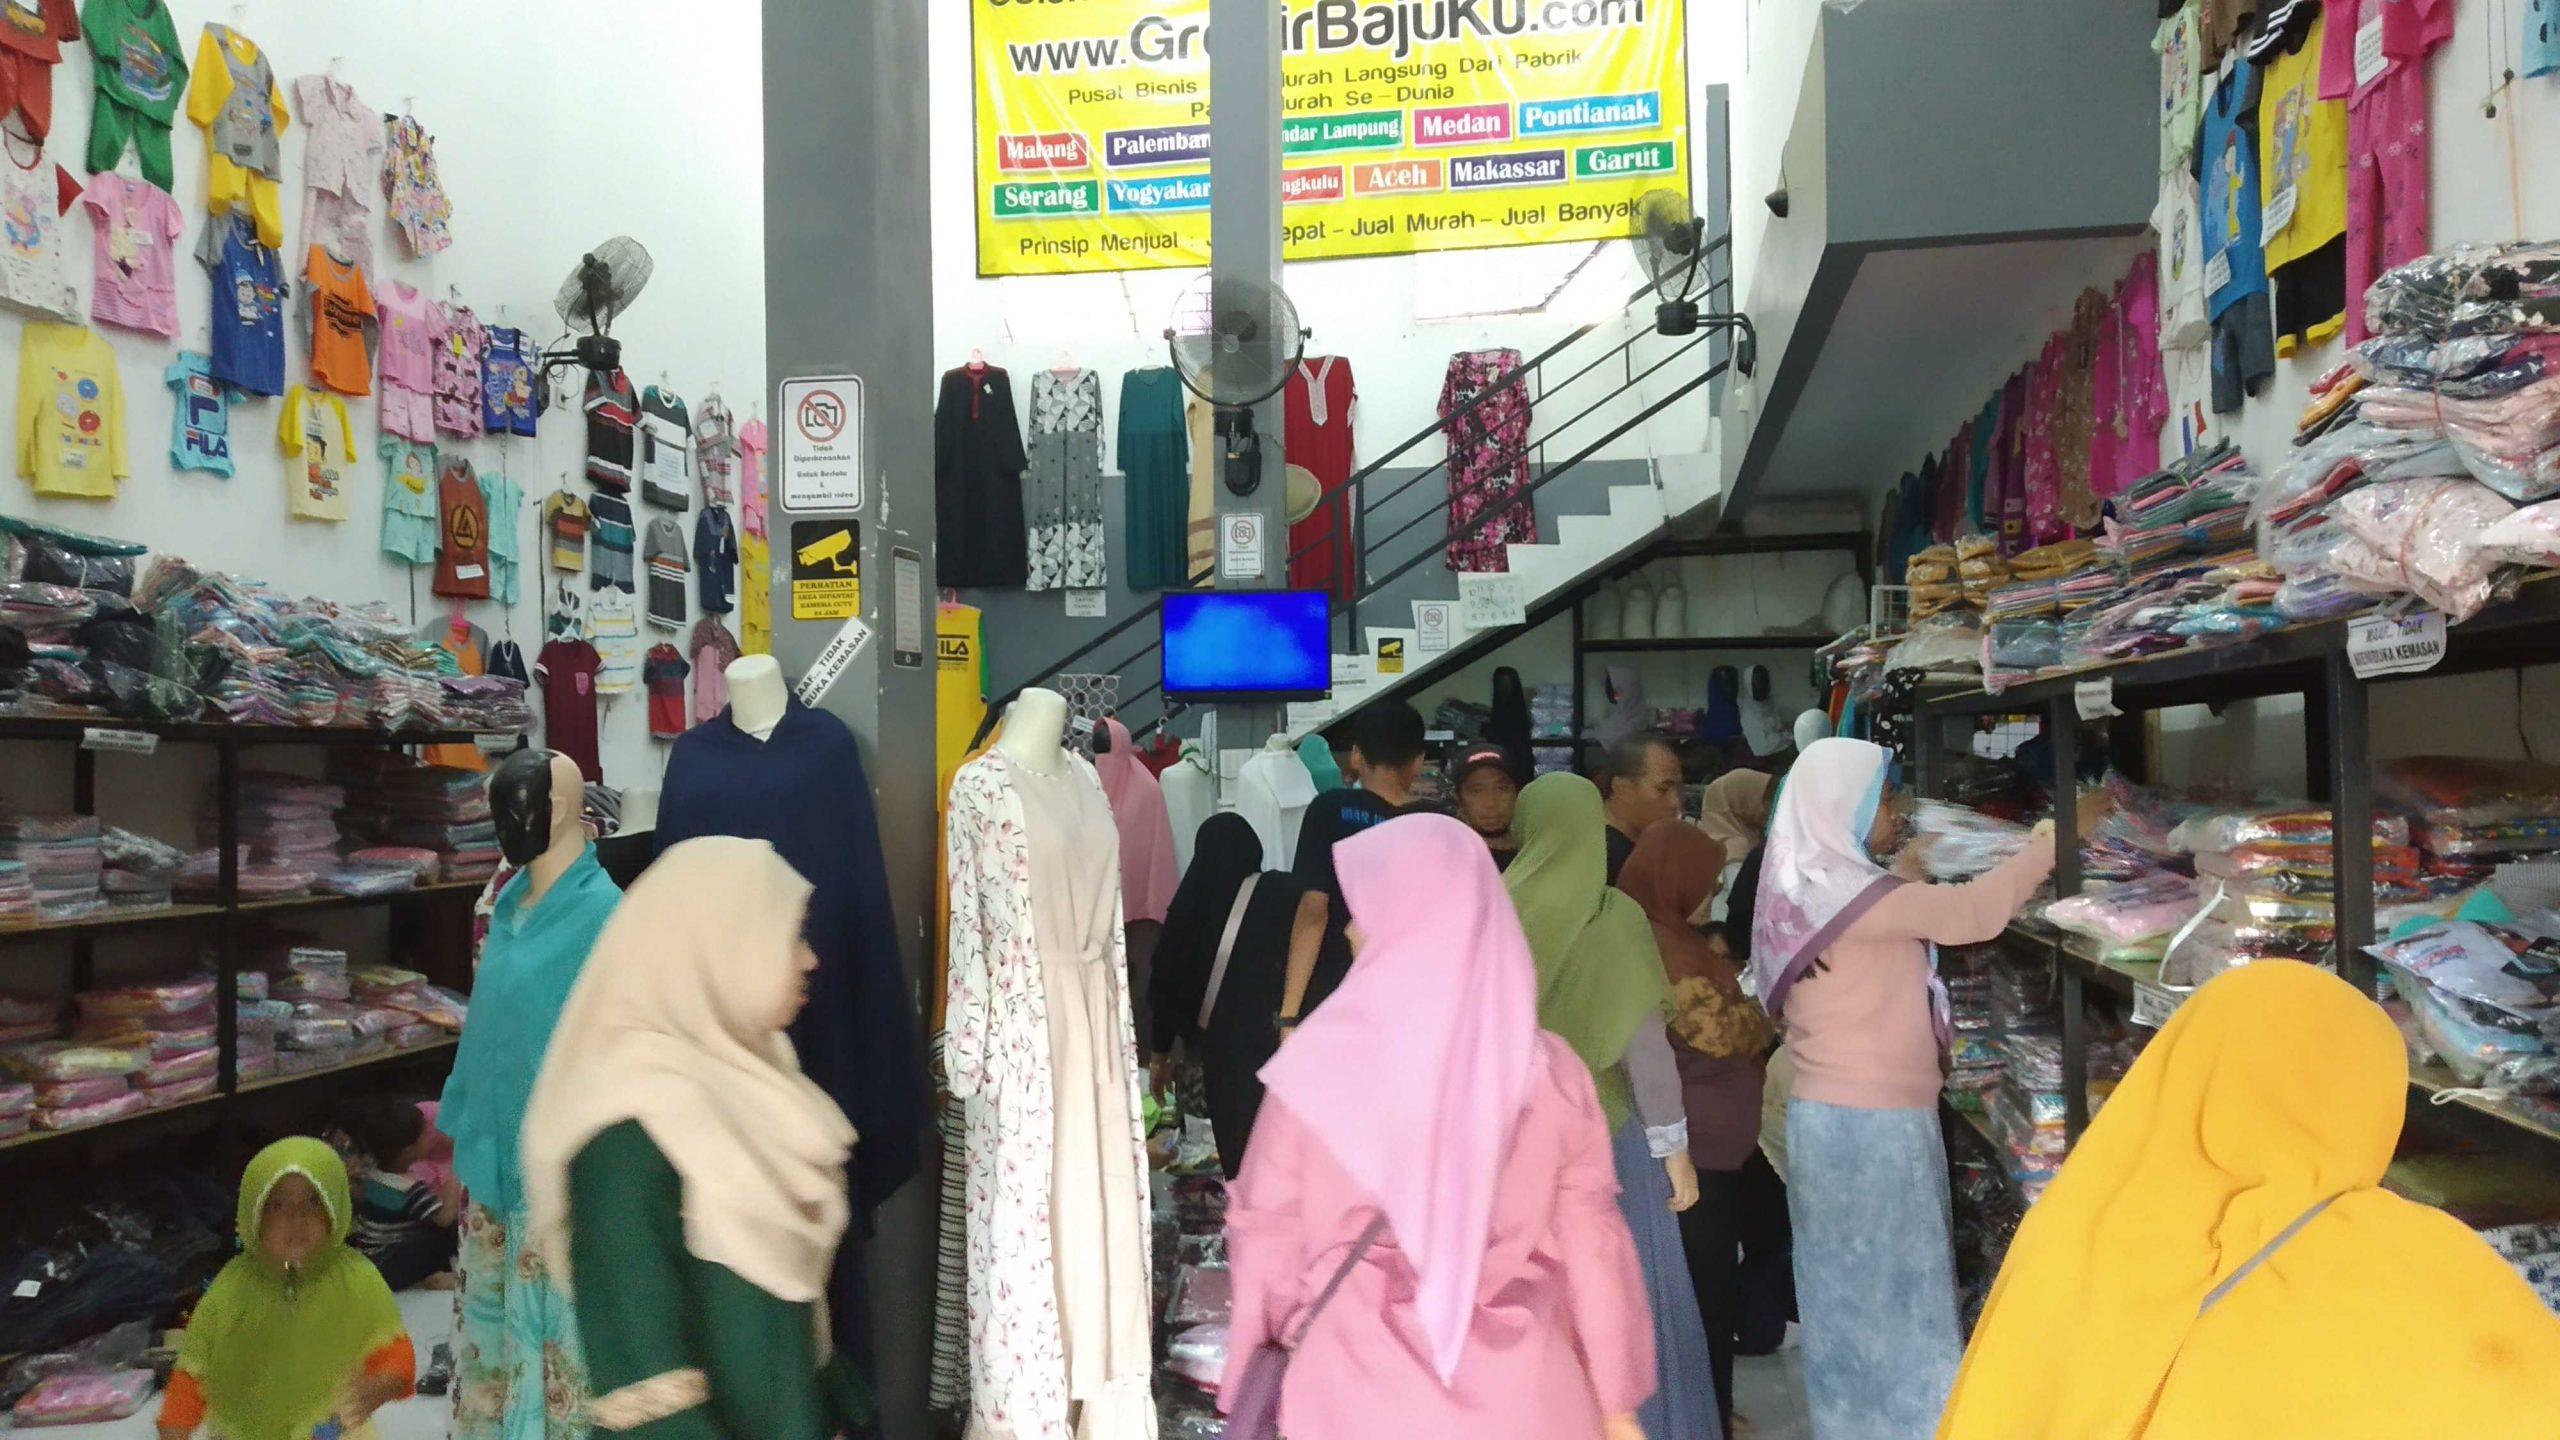 Grosir Daster Batik Katun Murah Bandung Obralan Baju Murah Langsung Dari Pabrik